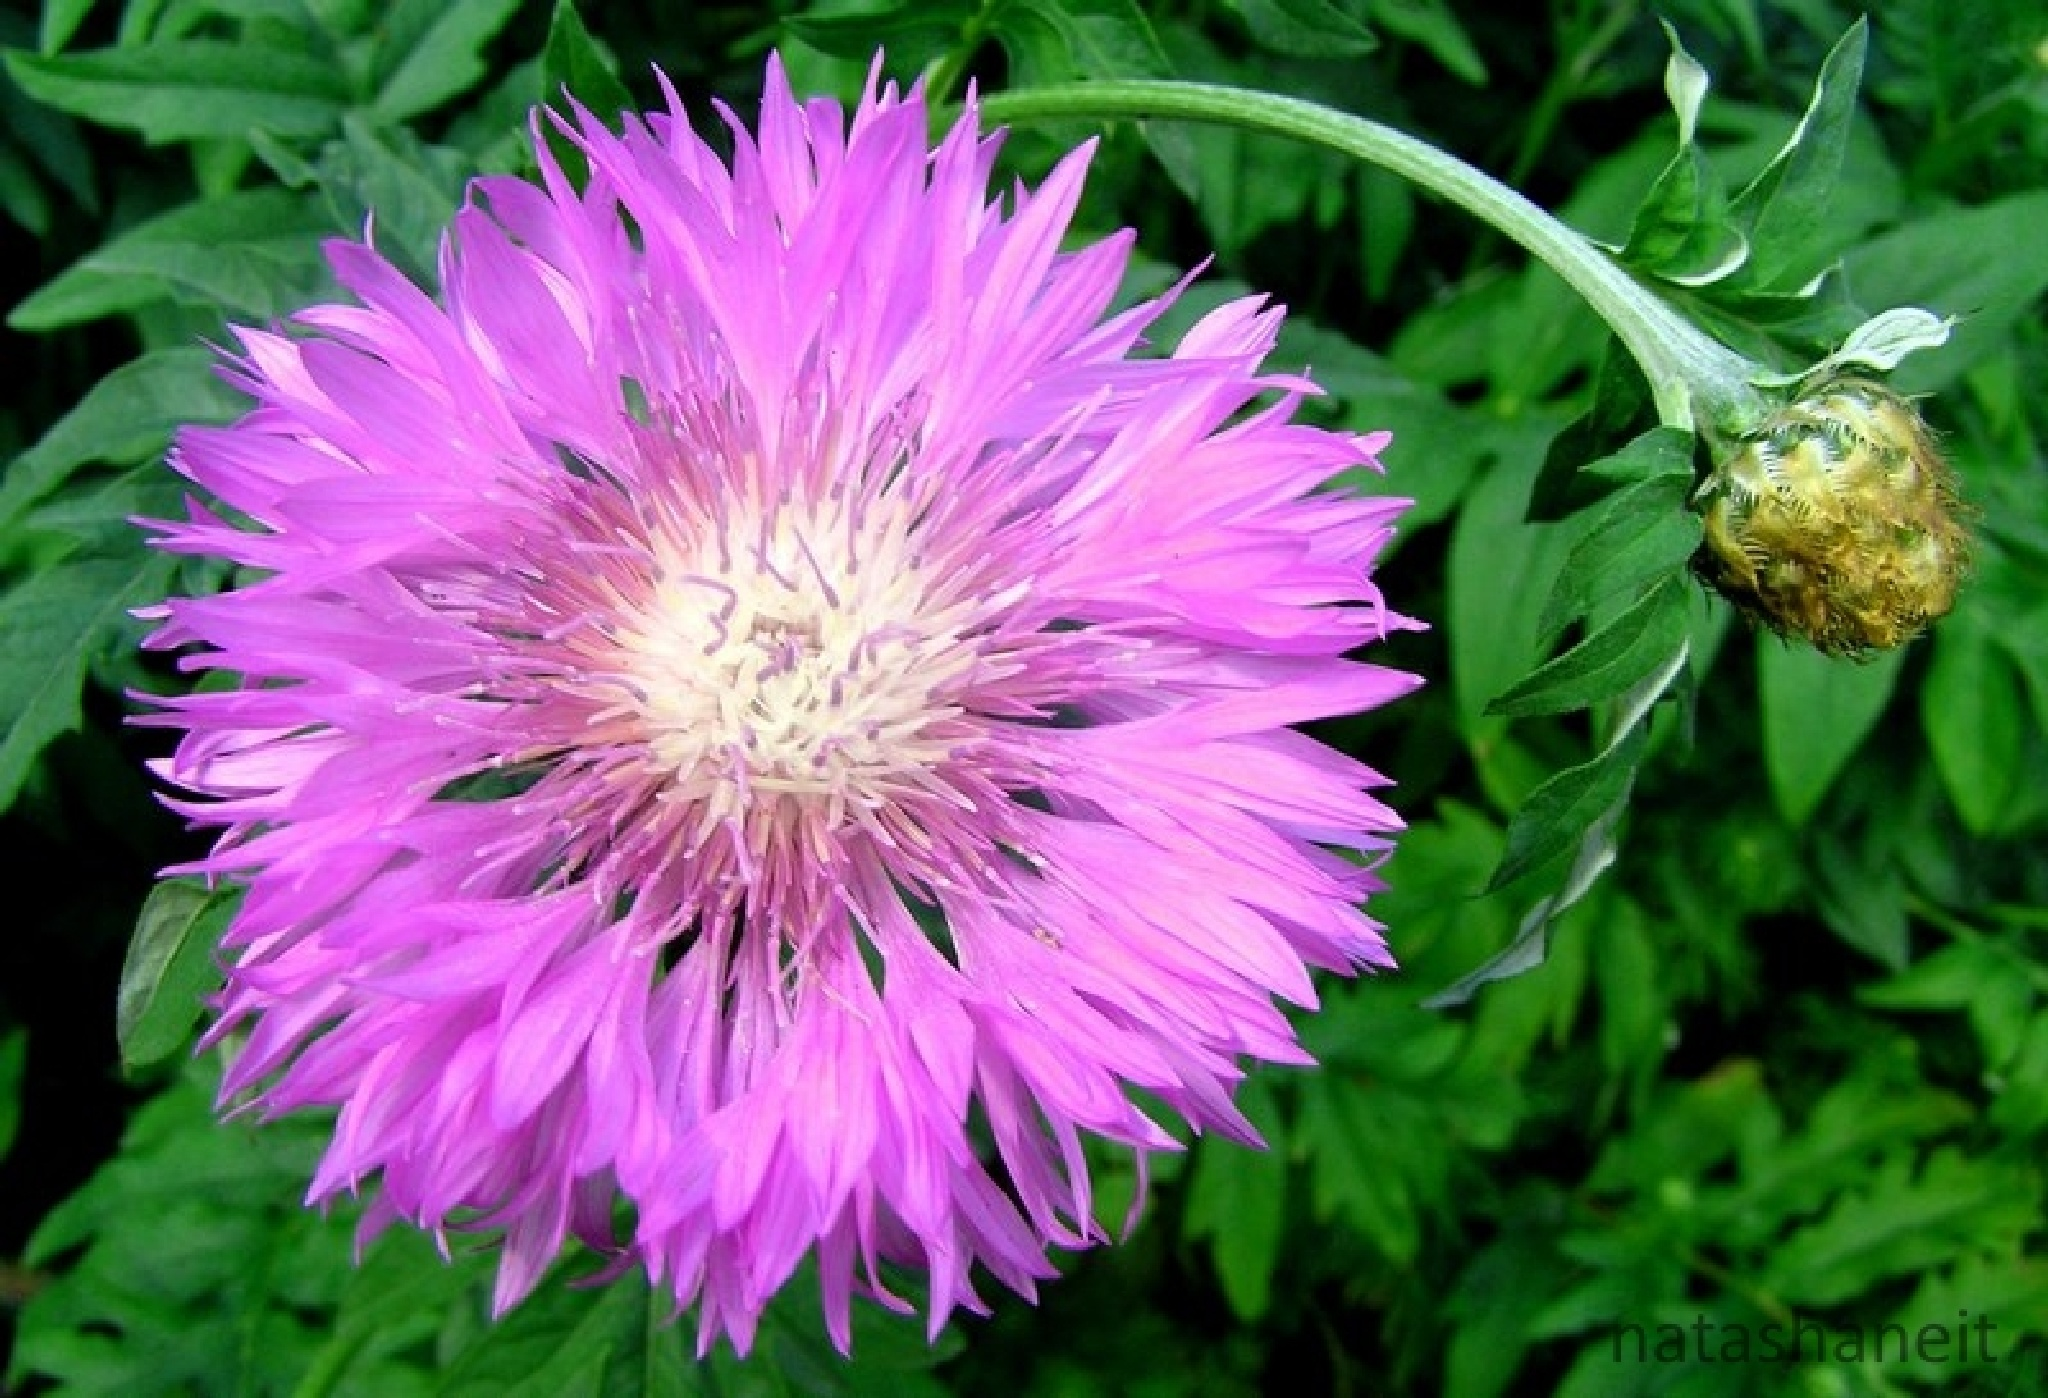 Summer flowers by natashaneit